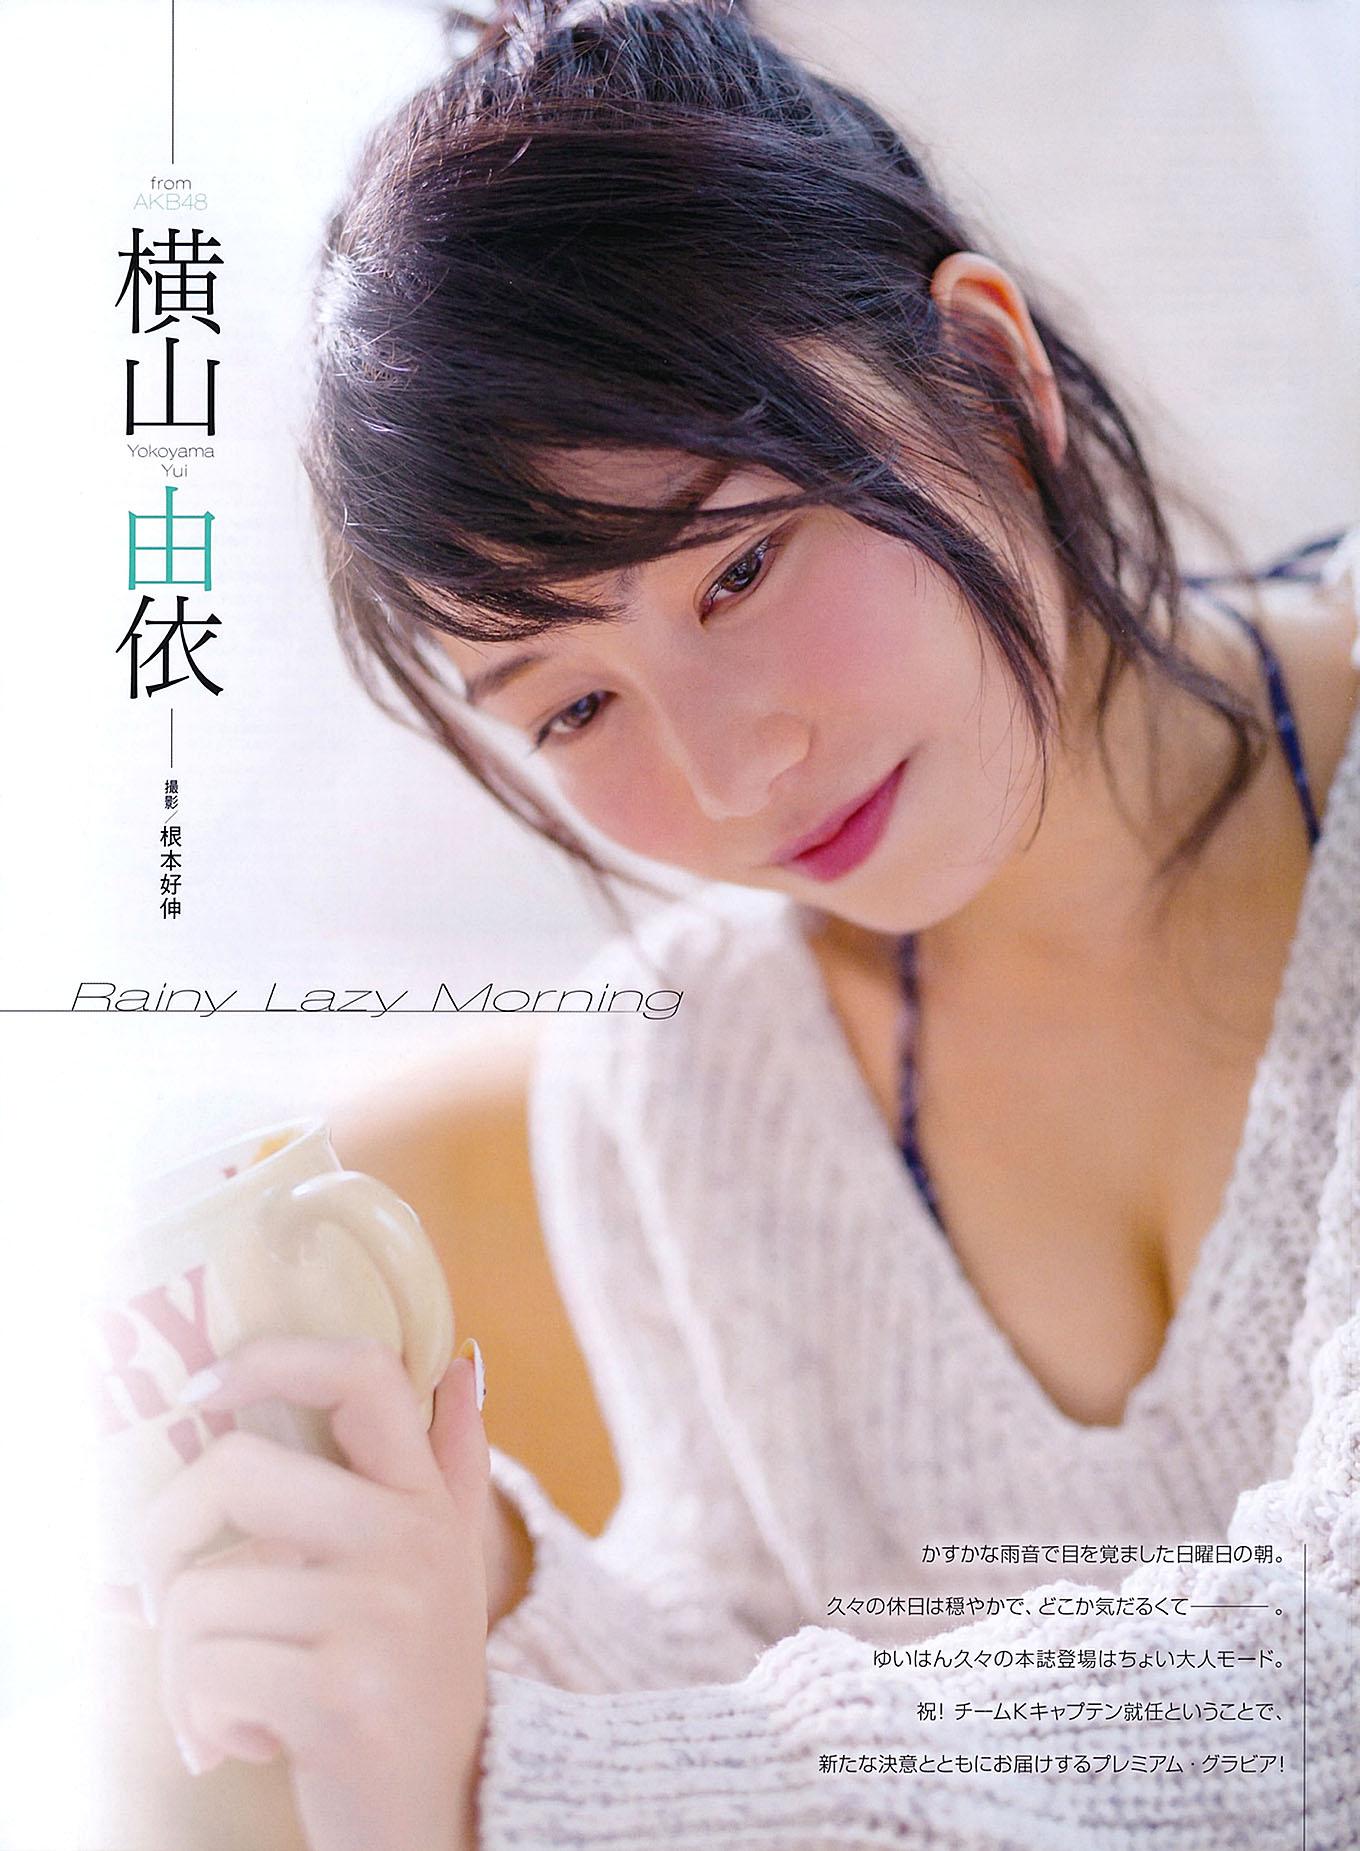 YYokoyama EnTame 1407 01.jpg